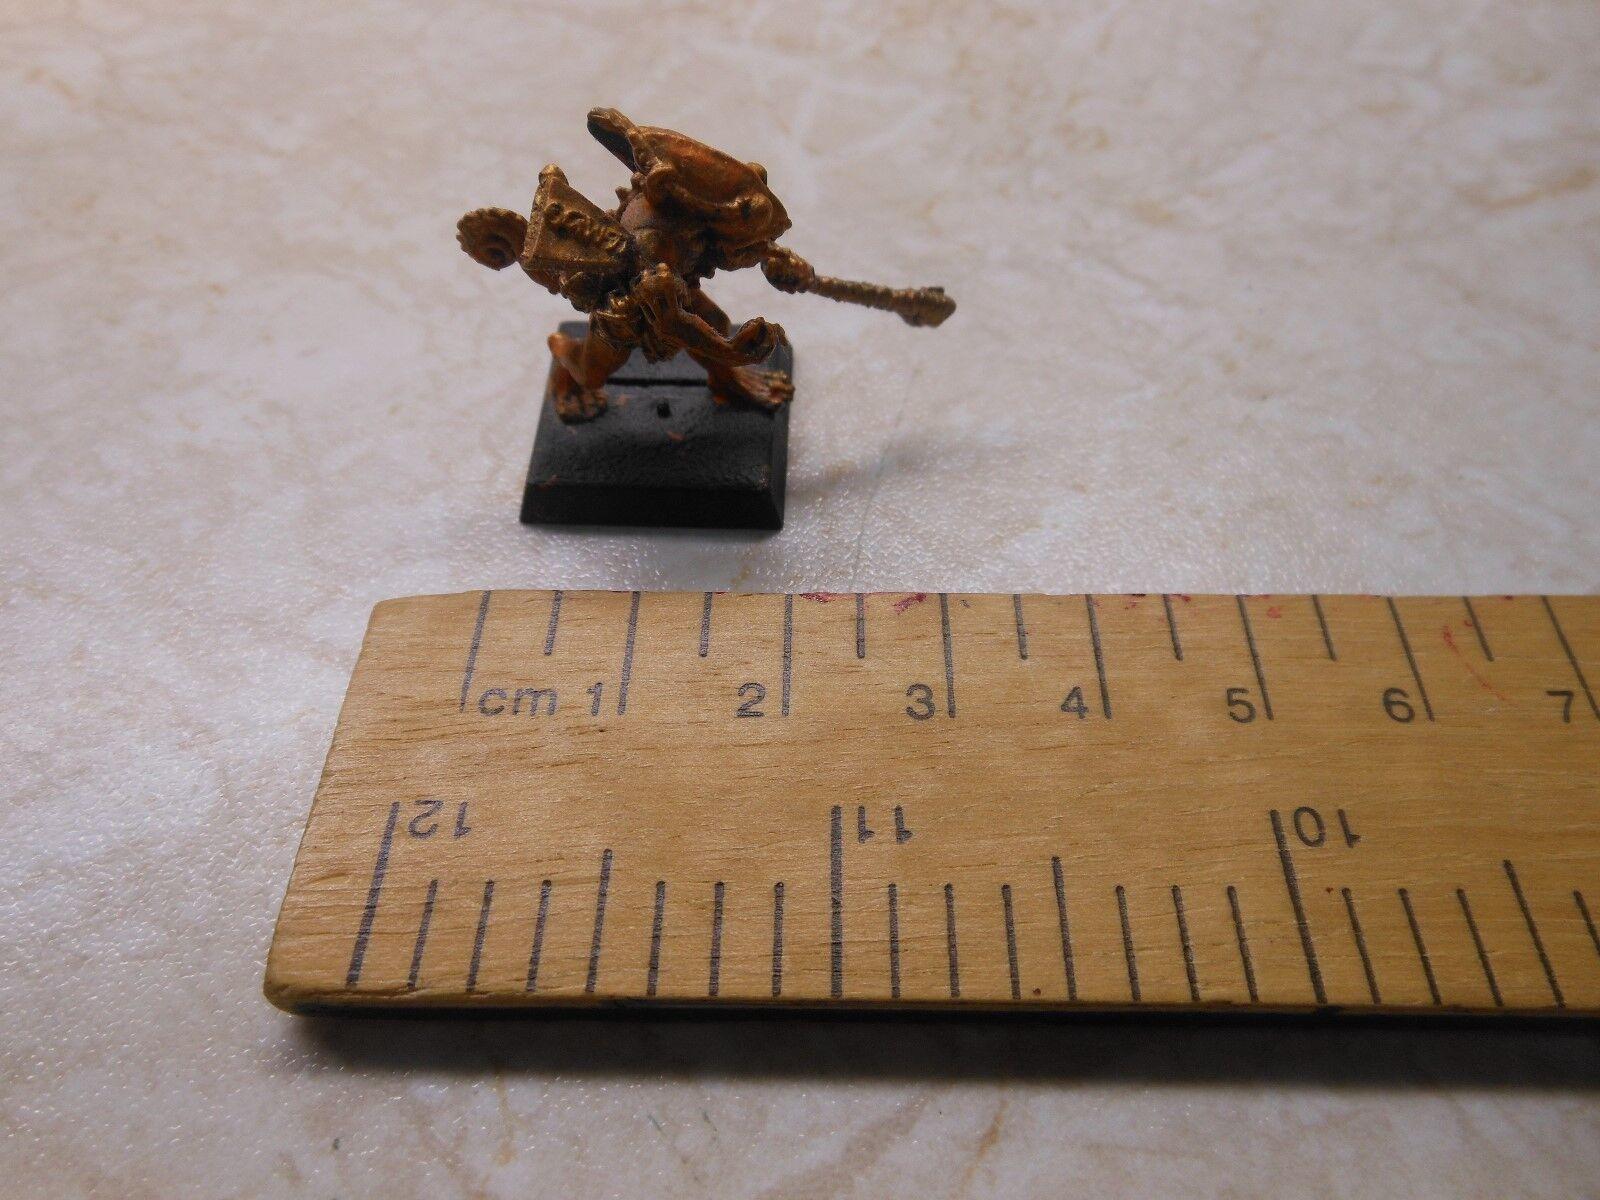 Warhammer Rare Matal Lizardman Oxyotl - Pre Owned